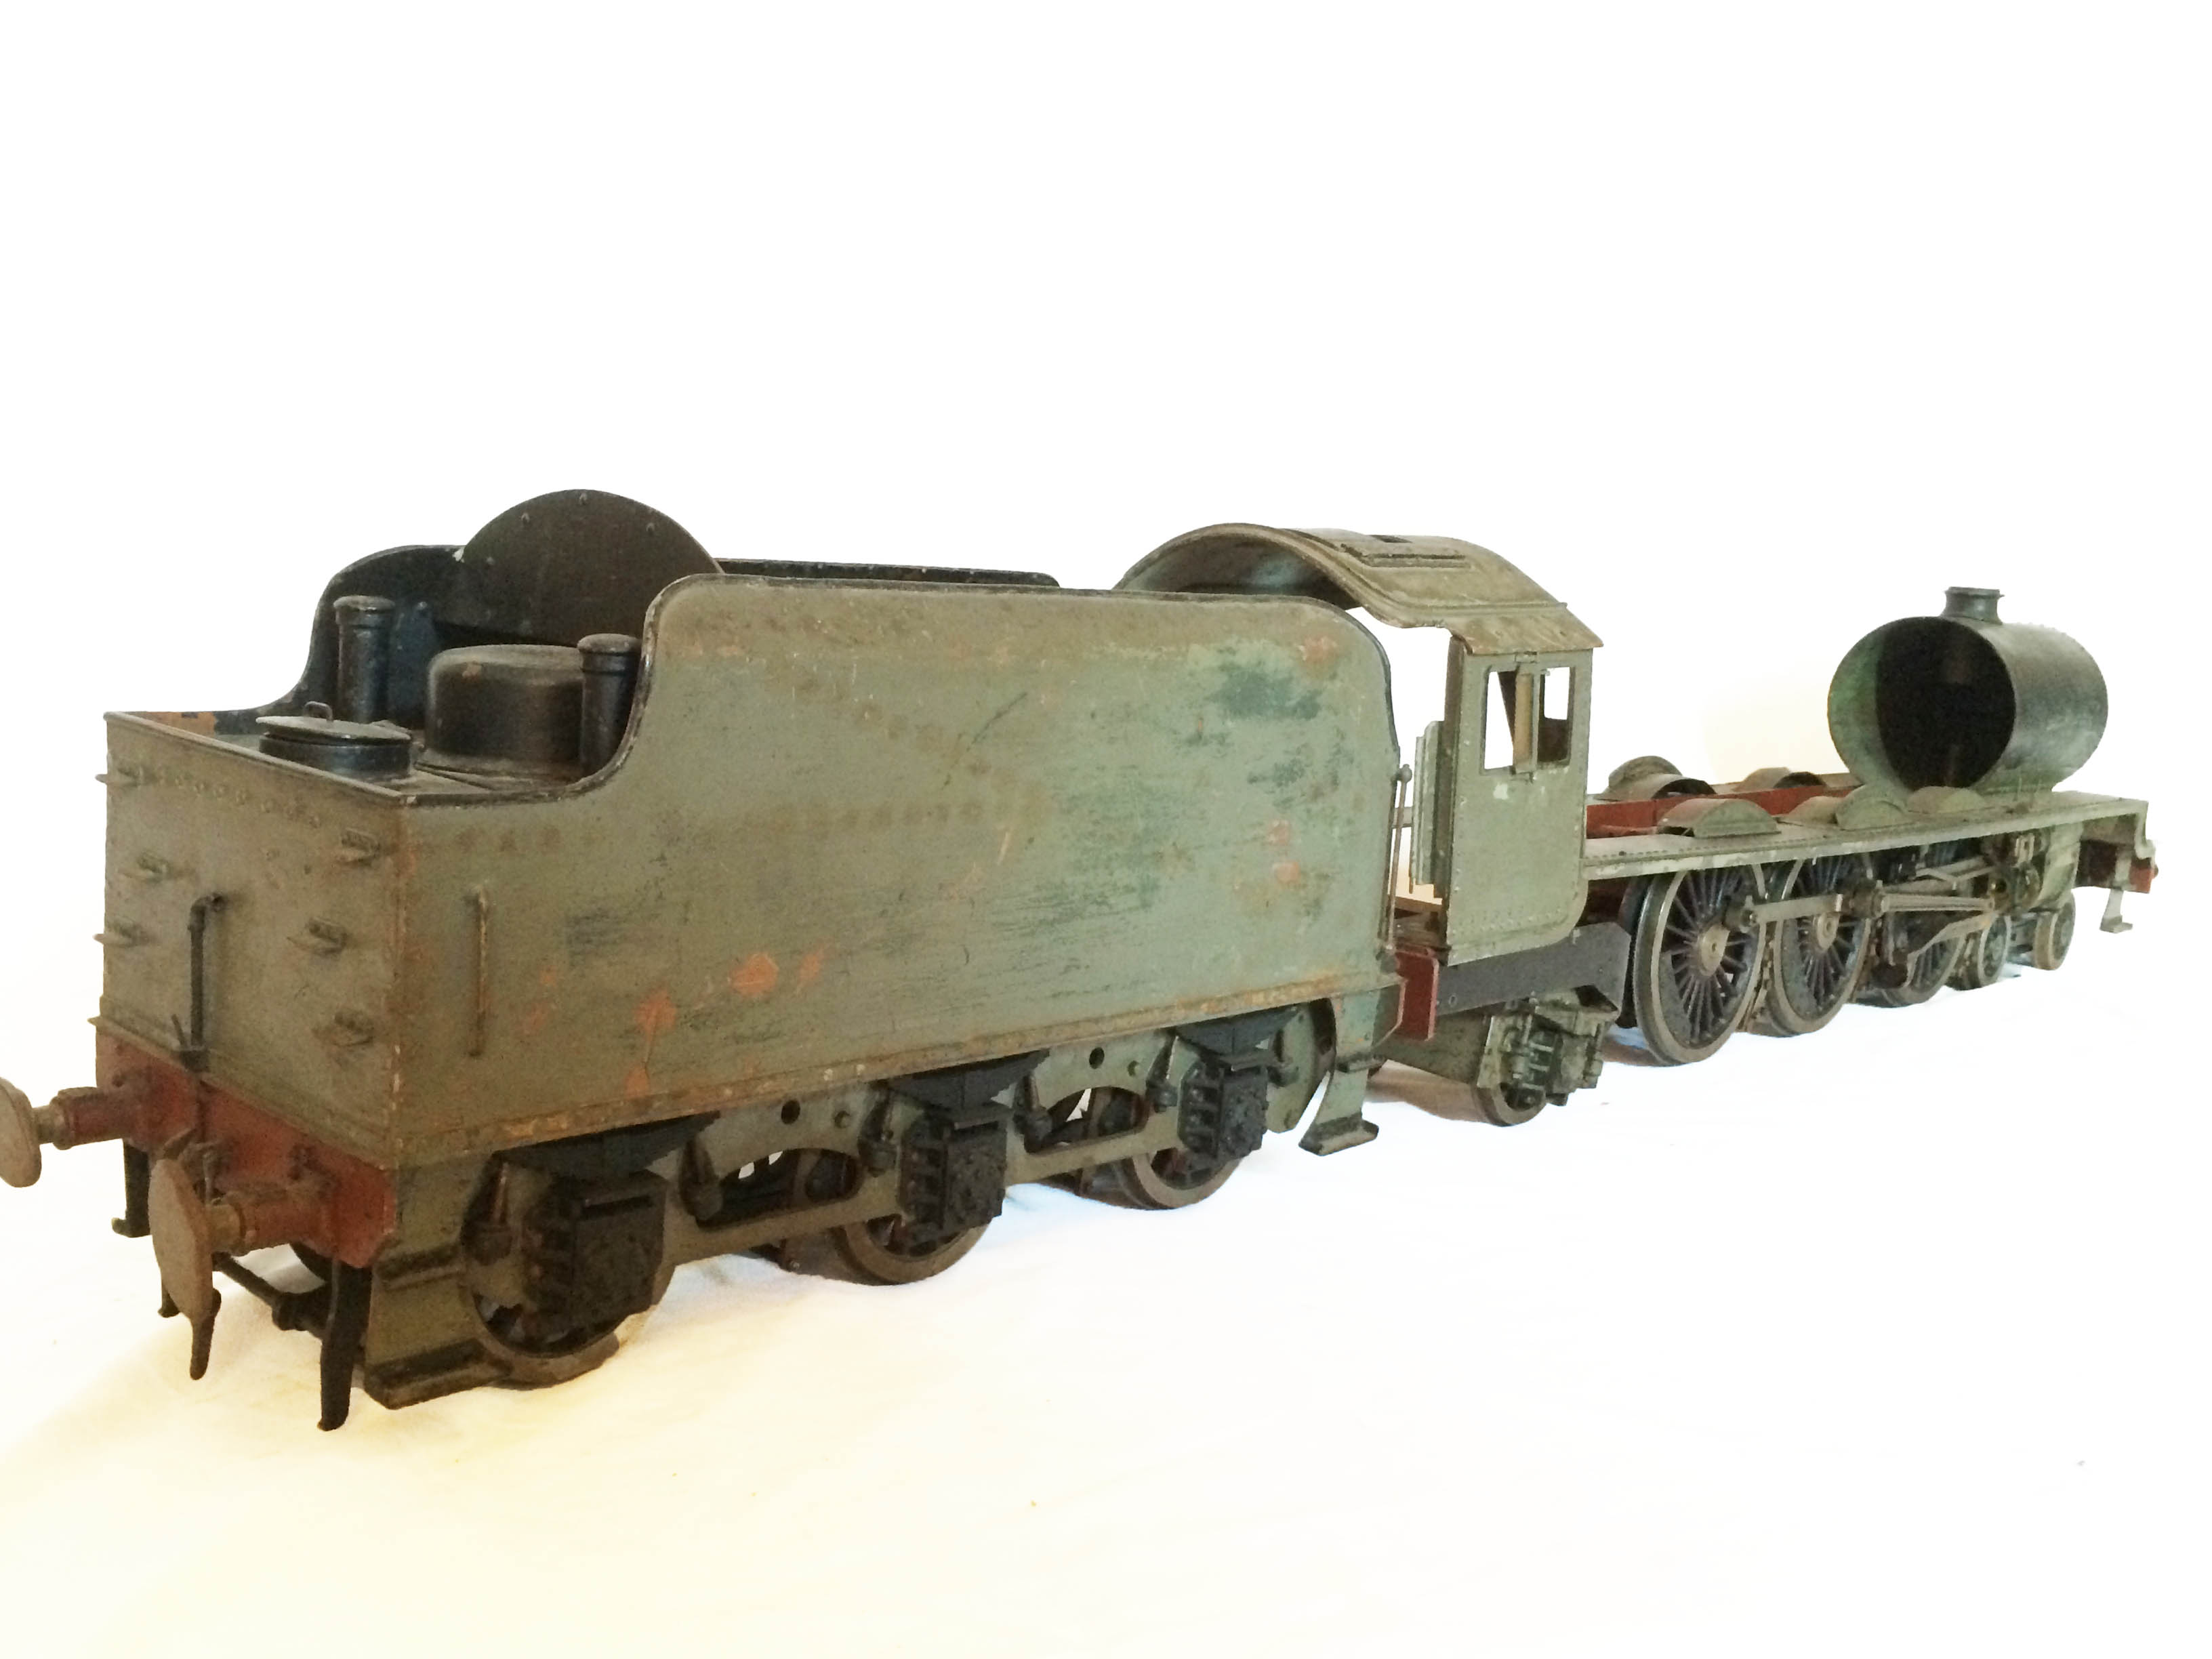 test LMS Princess Royal loco 03